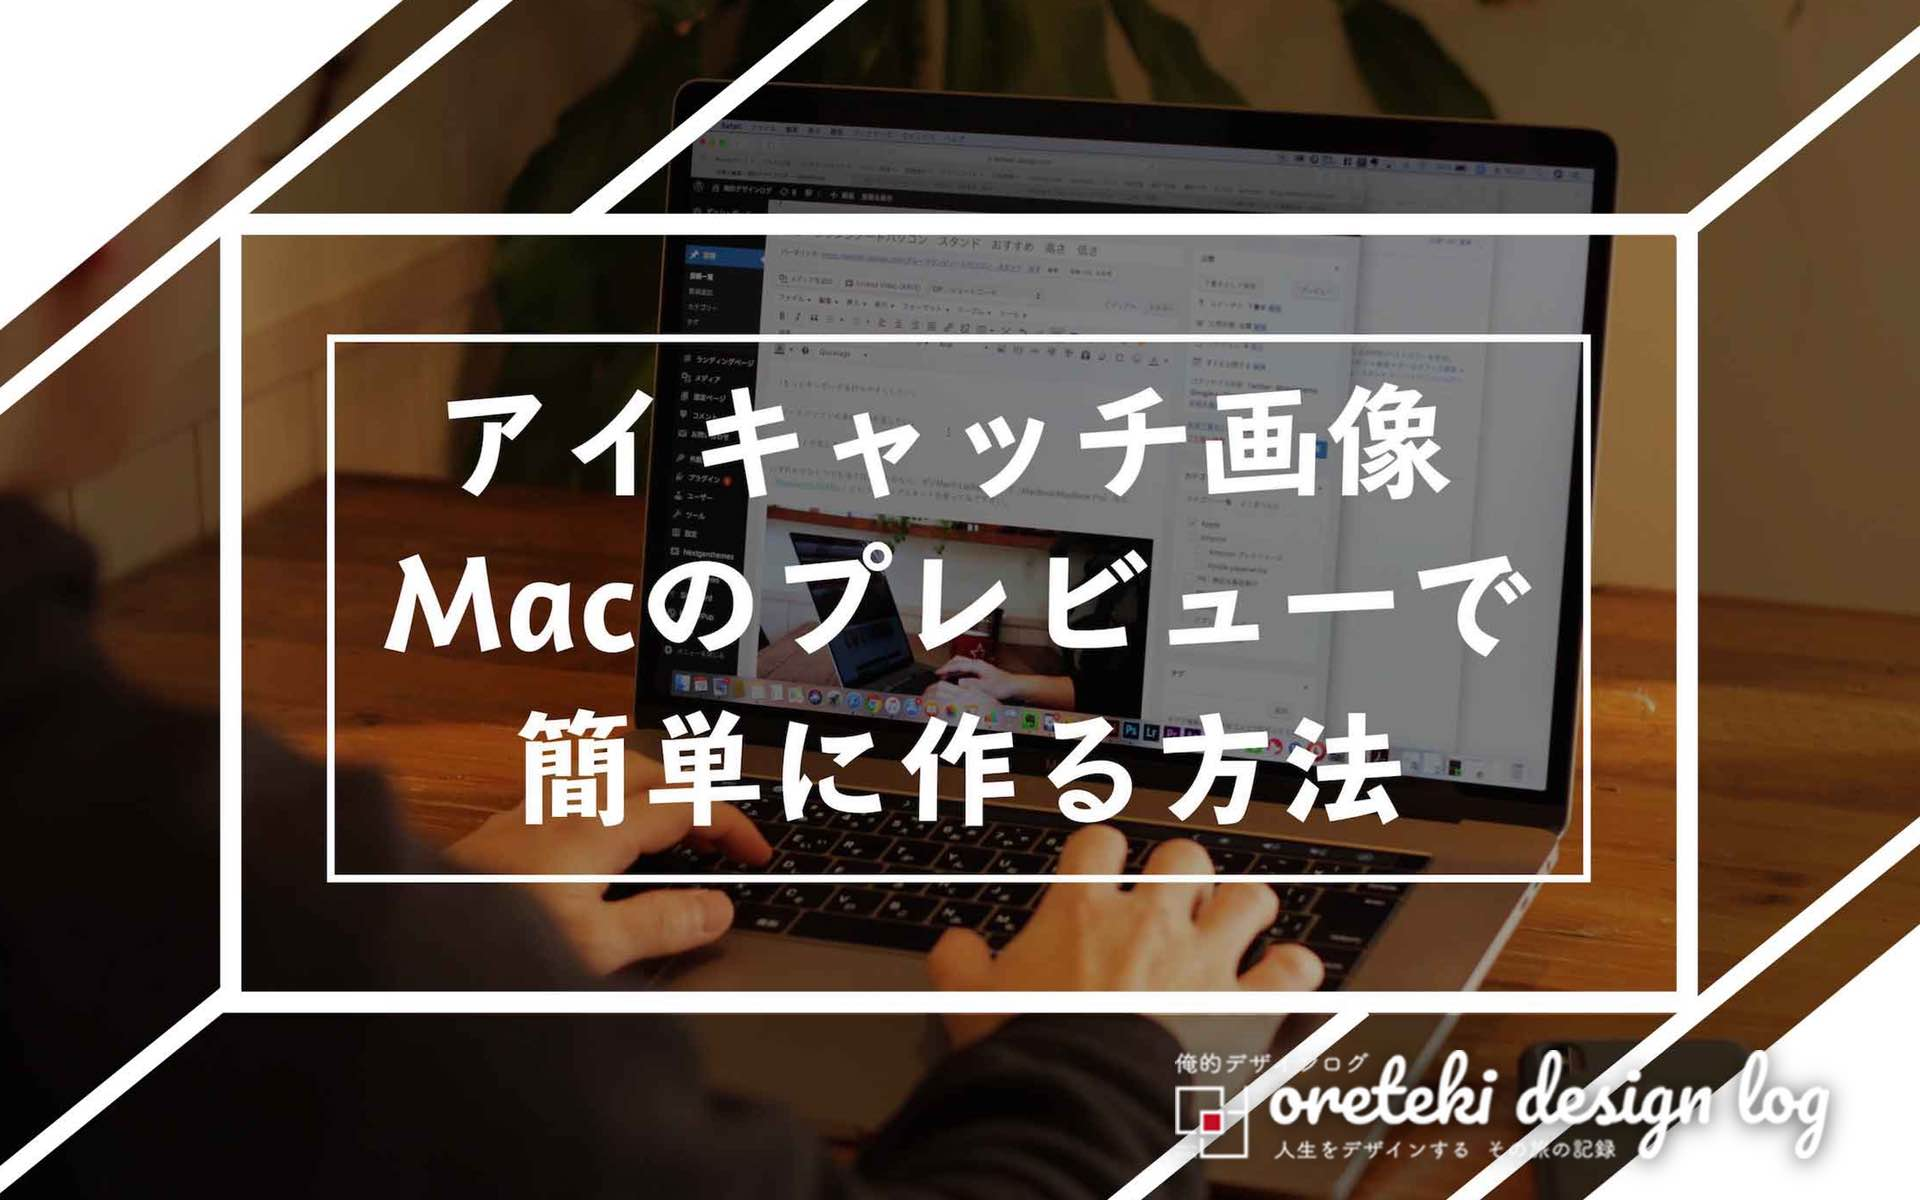 Macのプレビューでアイキャッチ画像を簡単に作る方法のアイキャッチ画像